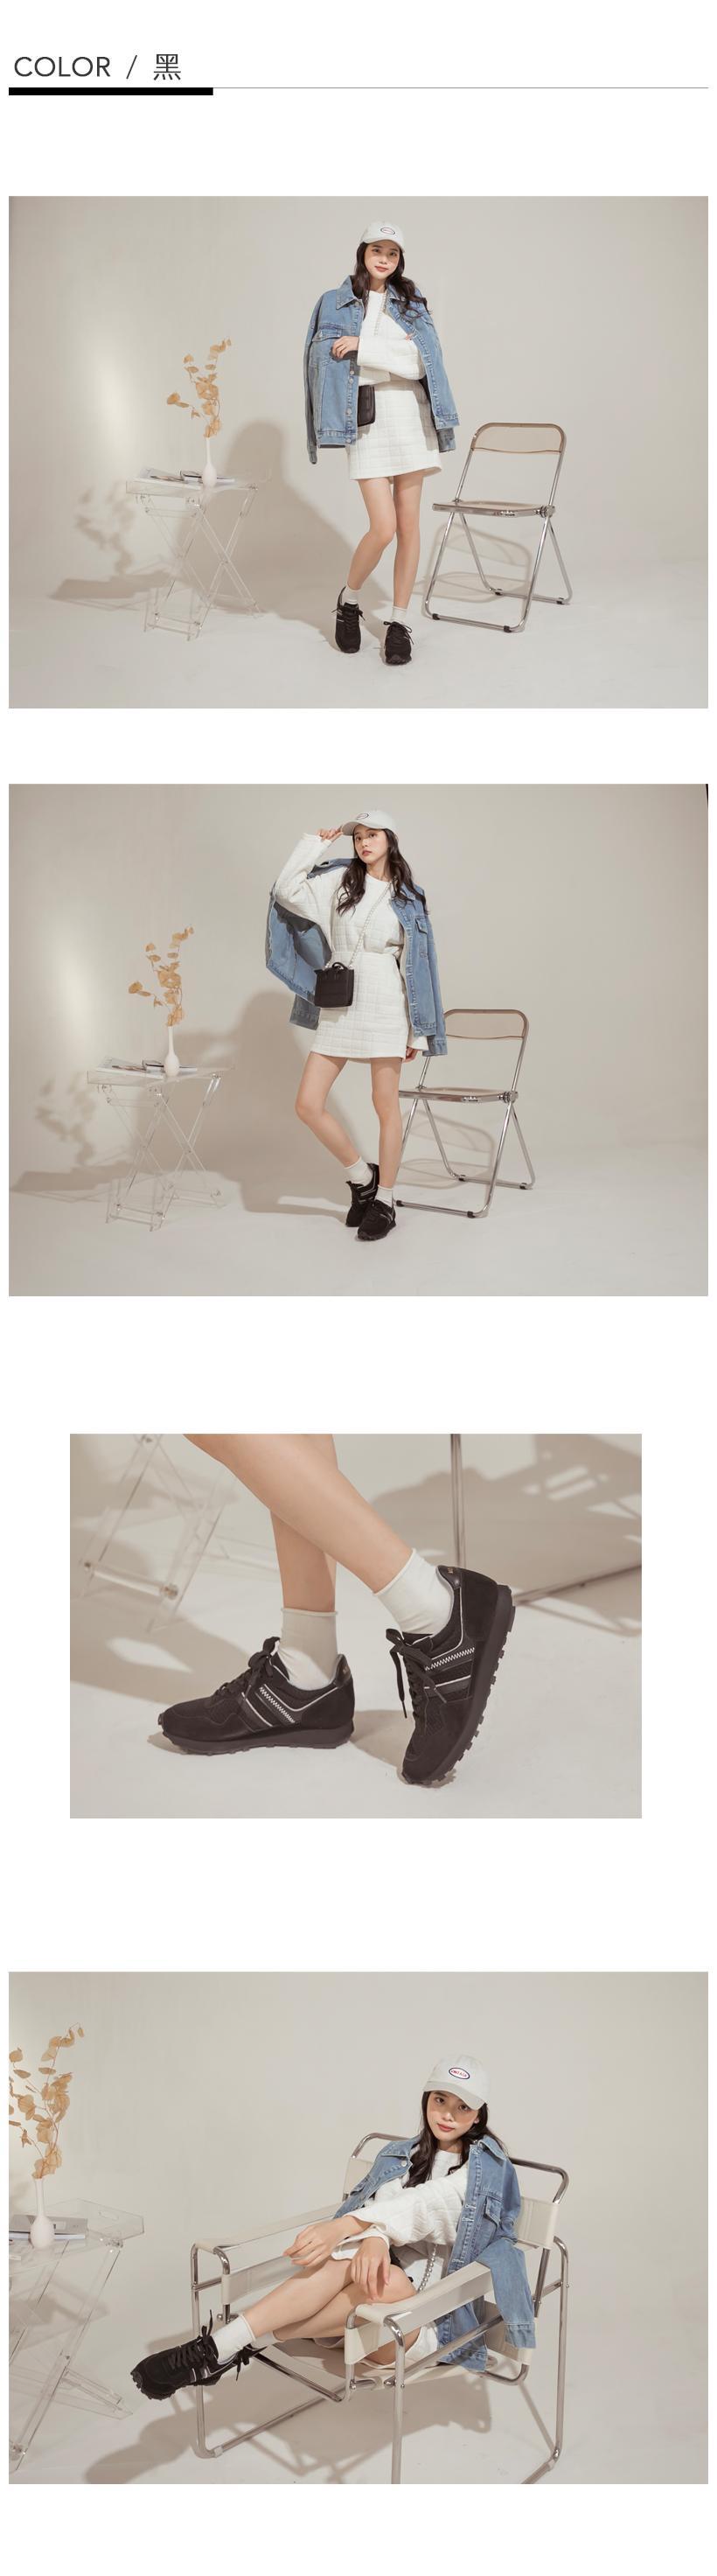 NeuTral-MIT防潑水復古休閒慢跑鞋(白黑)-大尺碼